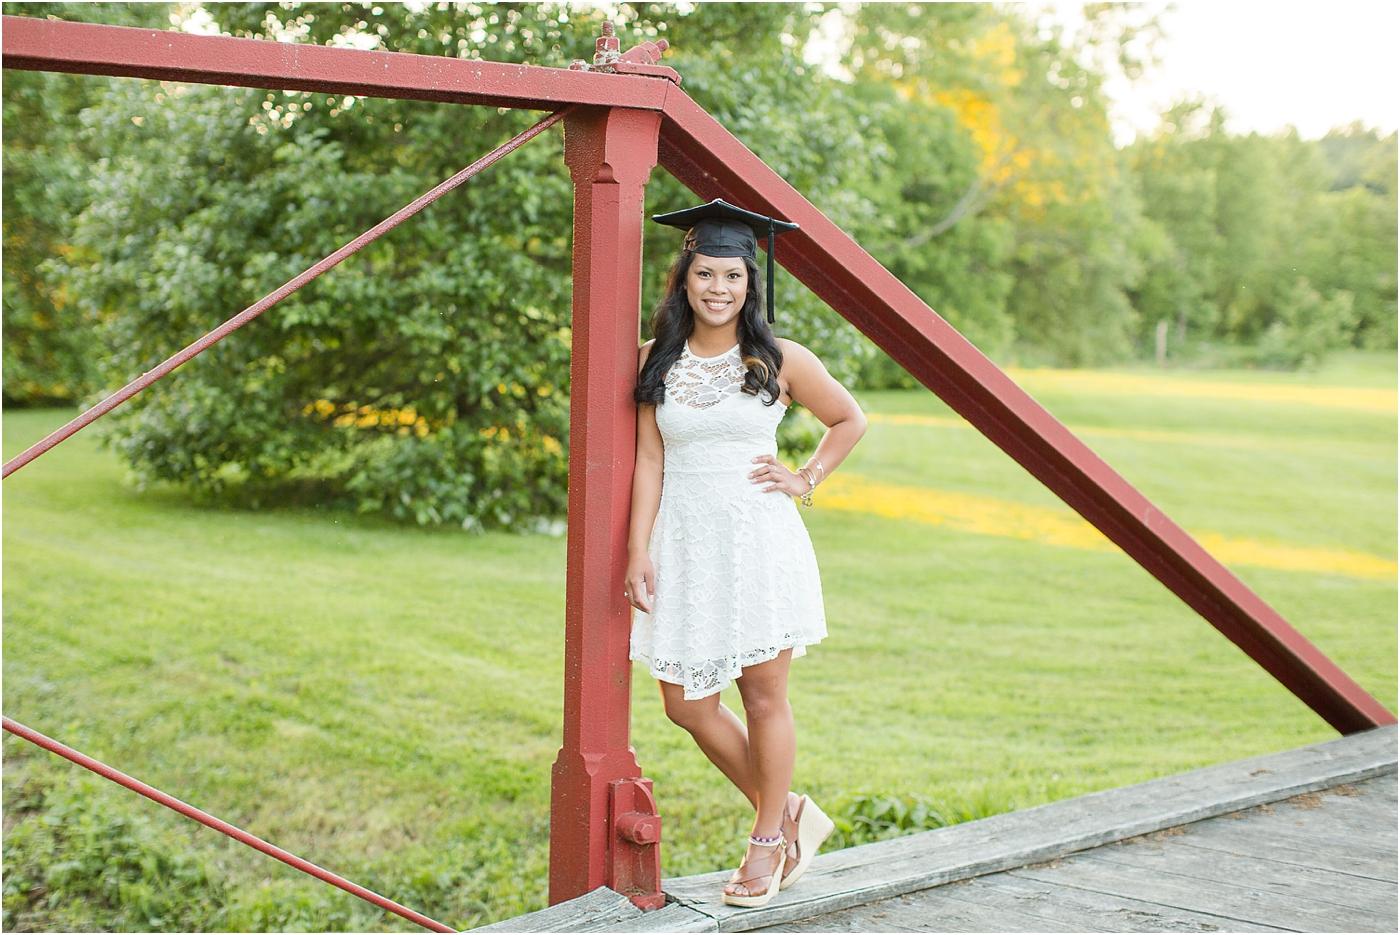 Jenna-Senior-2017-308-graduation-photos.jpg